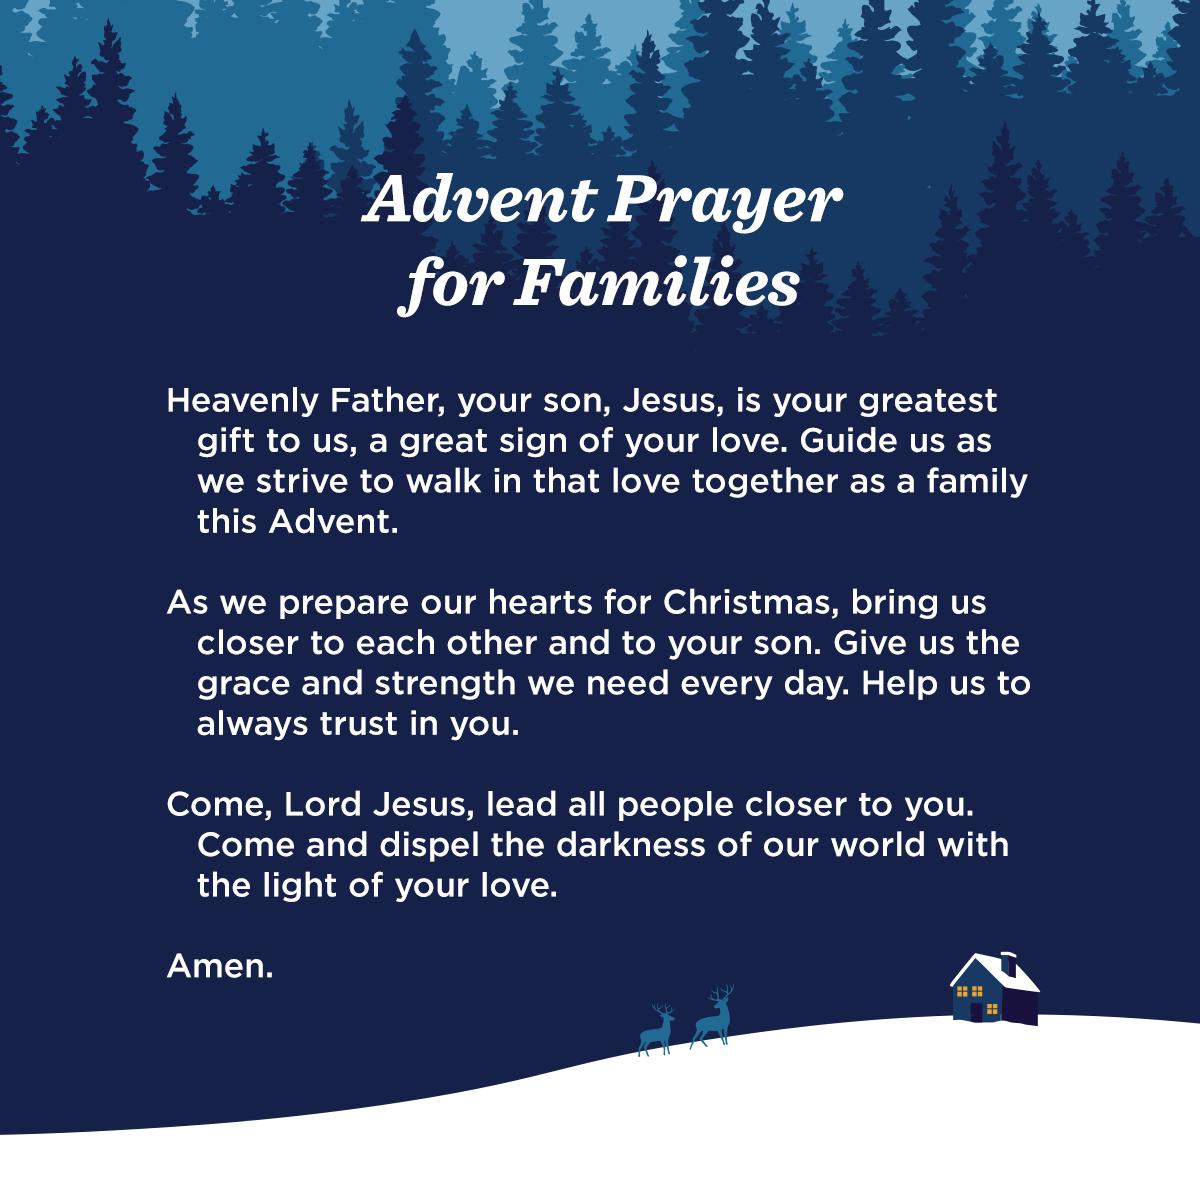 Catholic Advent Prayers Best Advent Ever Prayer For Family Advent Prayers Advent Prayers Catholic